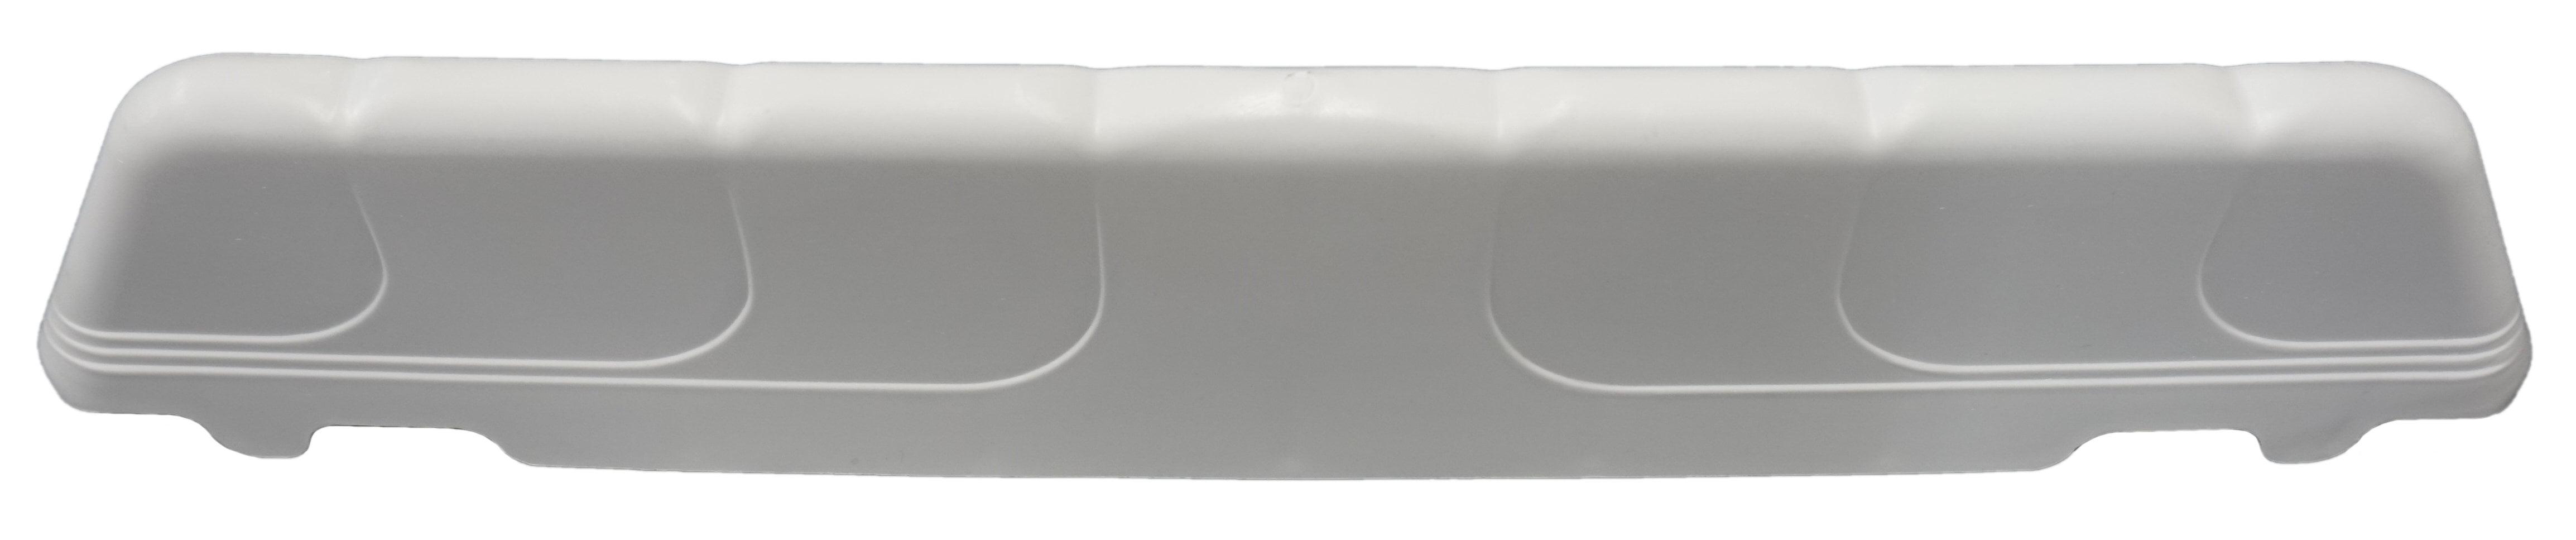 SA33001755 SAWP33001755 Dryer Drum Baffle for Roper